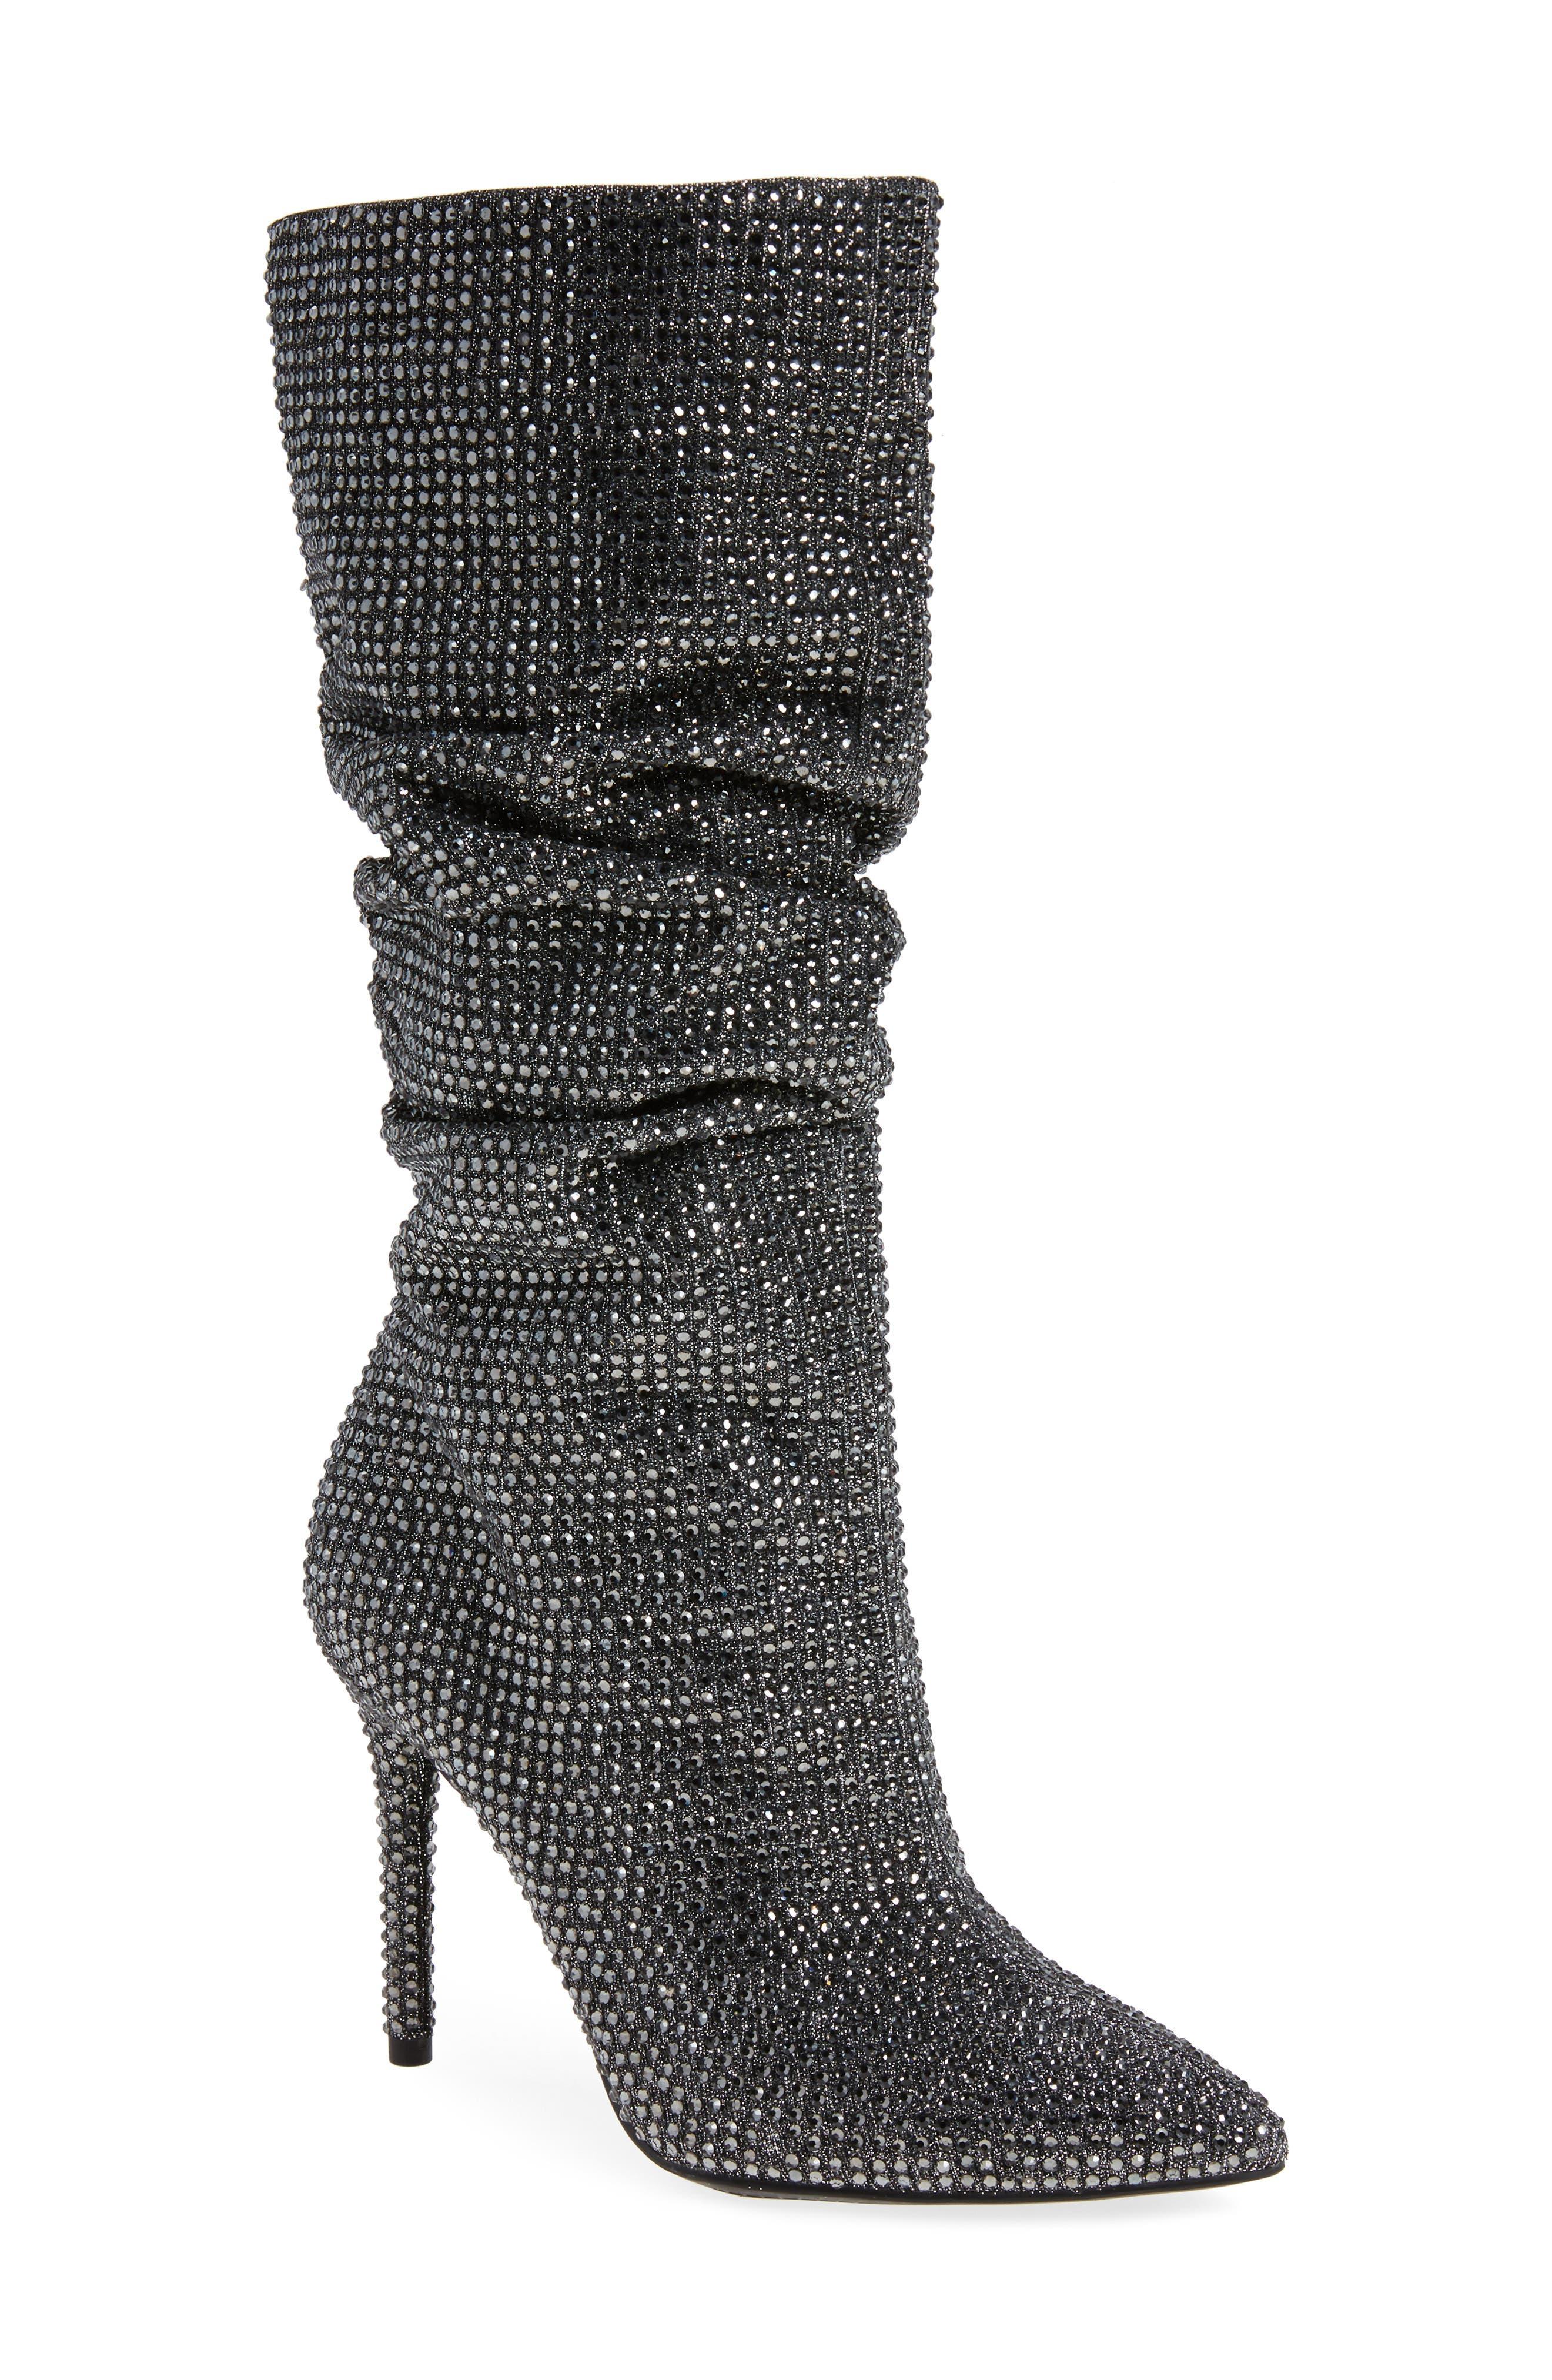 Main Image - Jessica Simpson Layzer Embellished Slouch Boot (Women)